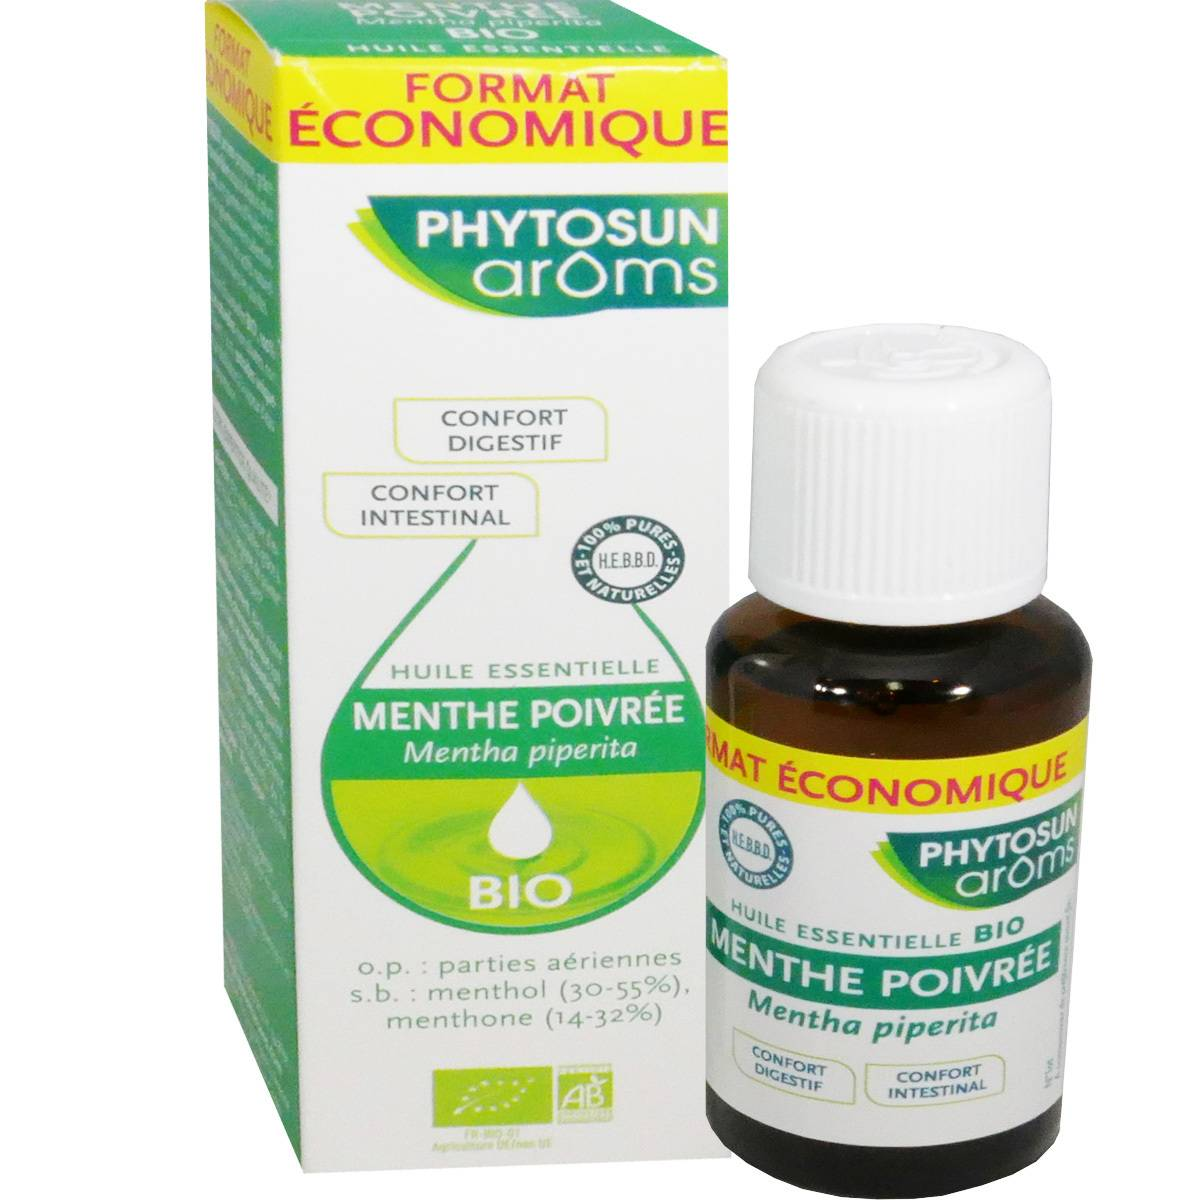 Phytosun aroms huile essentielle menthe poivree digestion 30 ml